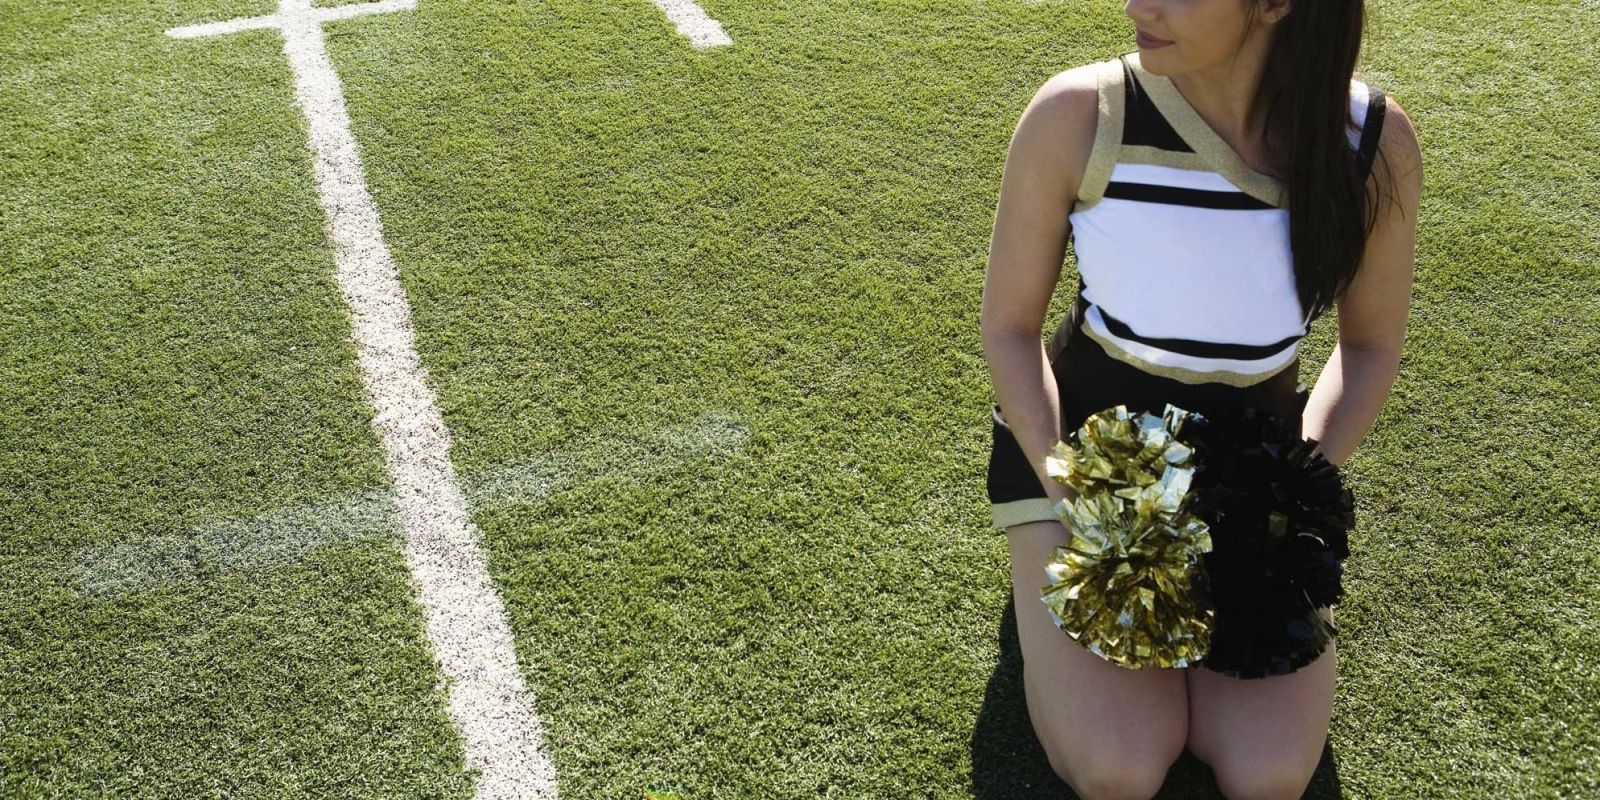 College cheerleaders shower